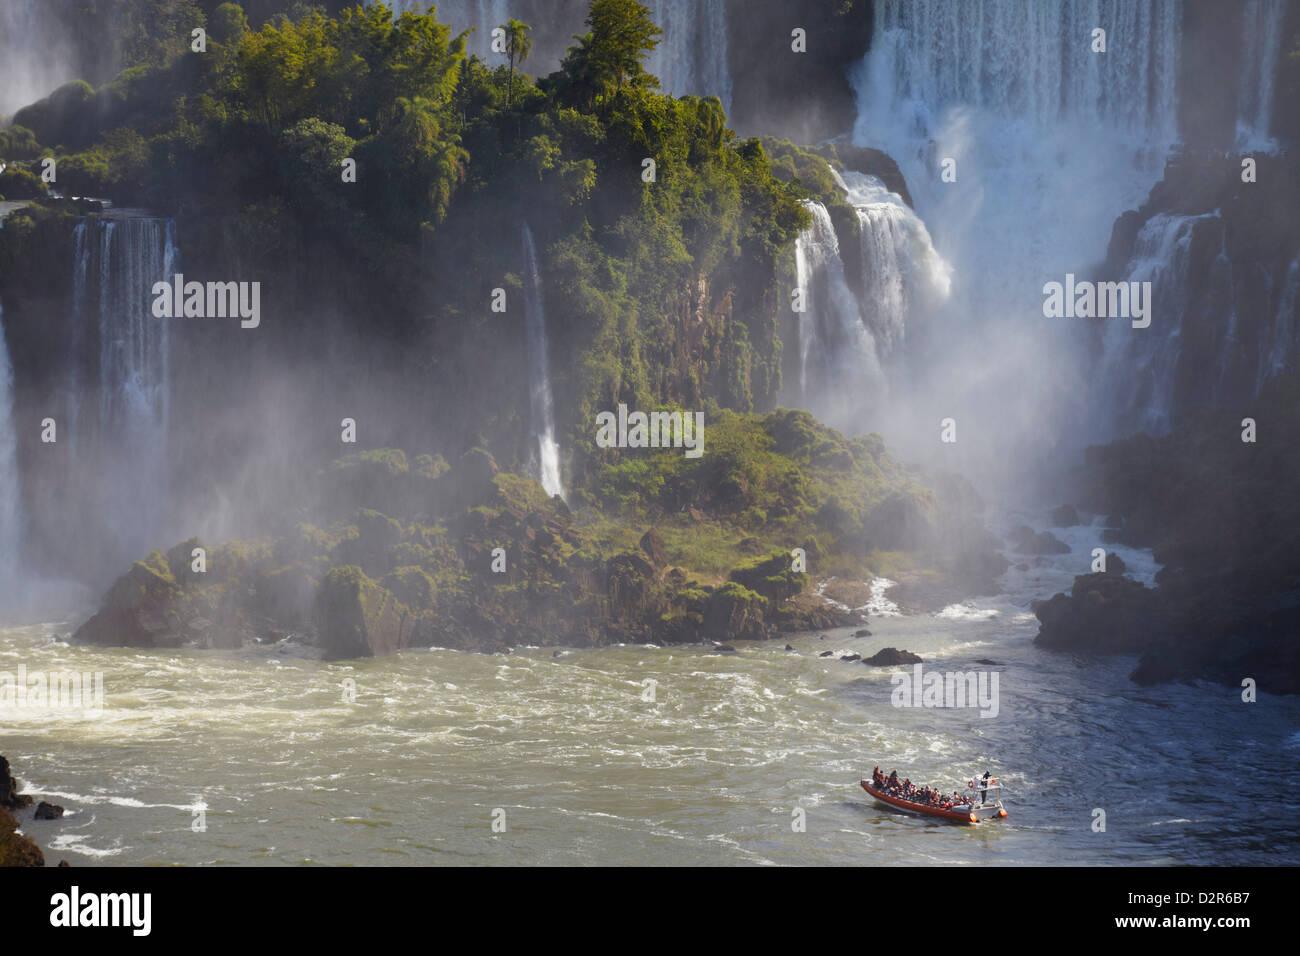 Tourist boat approaching Argentinean side of Iguacu Falls, Iguacu National Park, Parana, Brazil - Stock Image